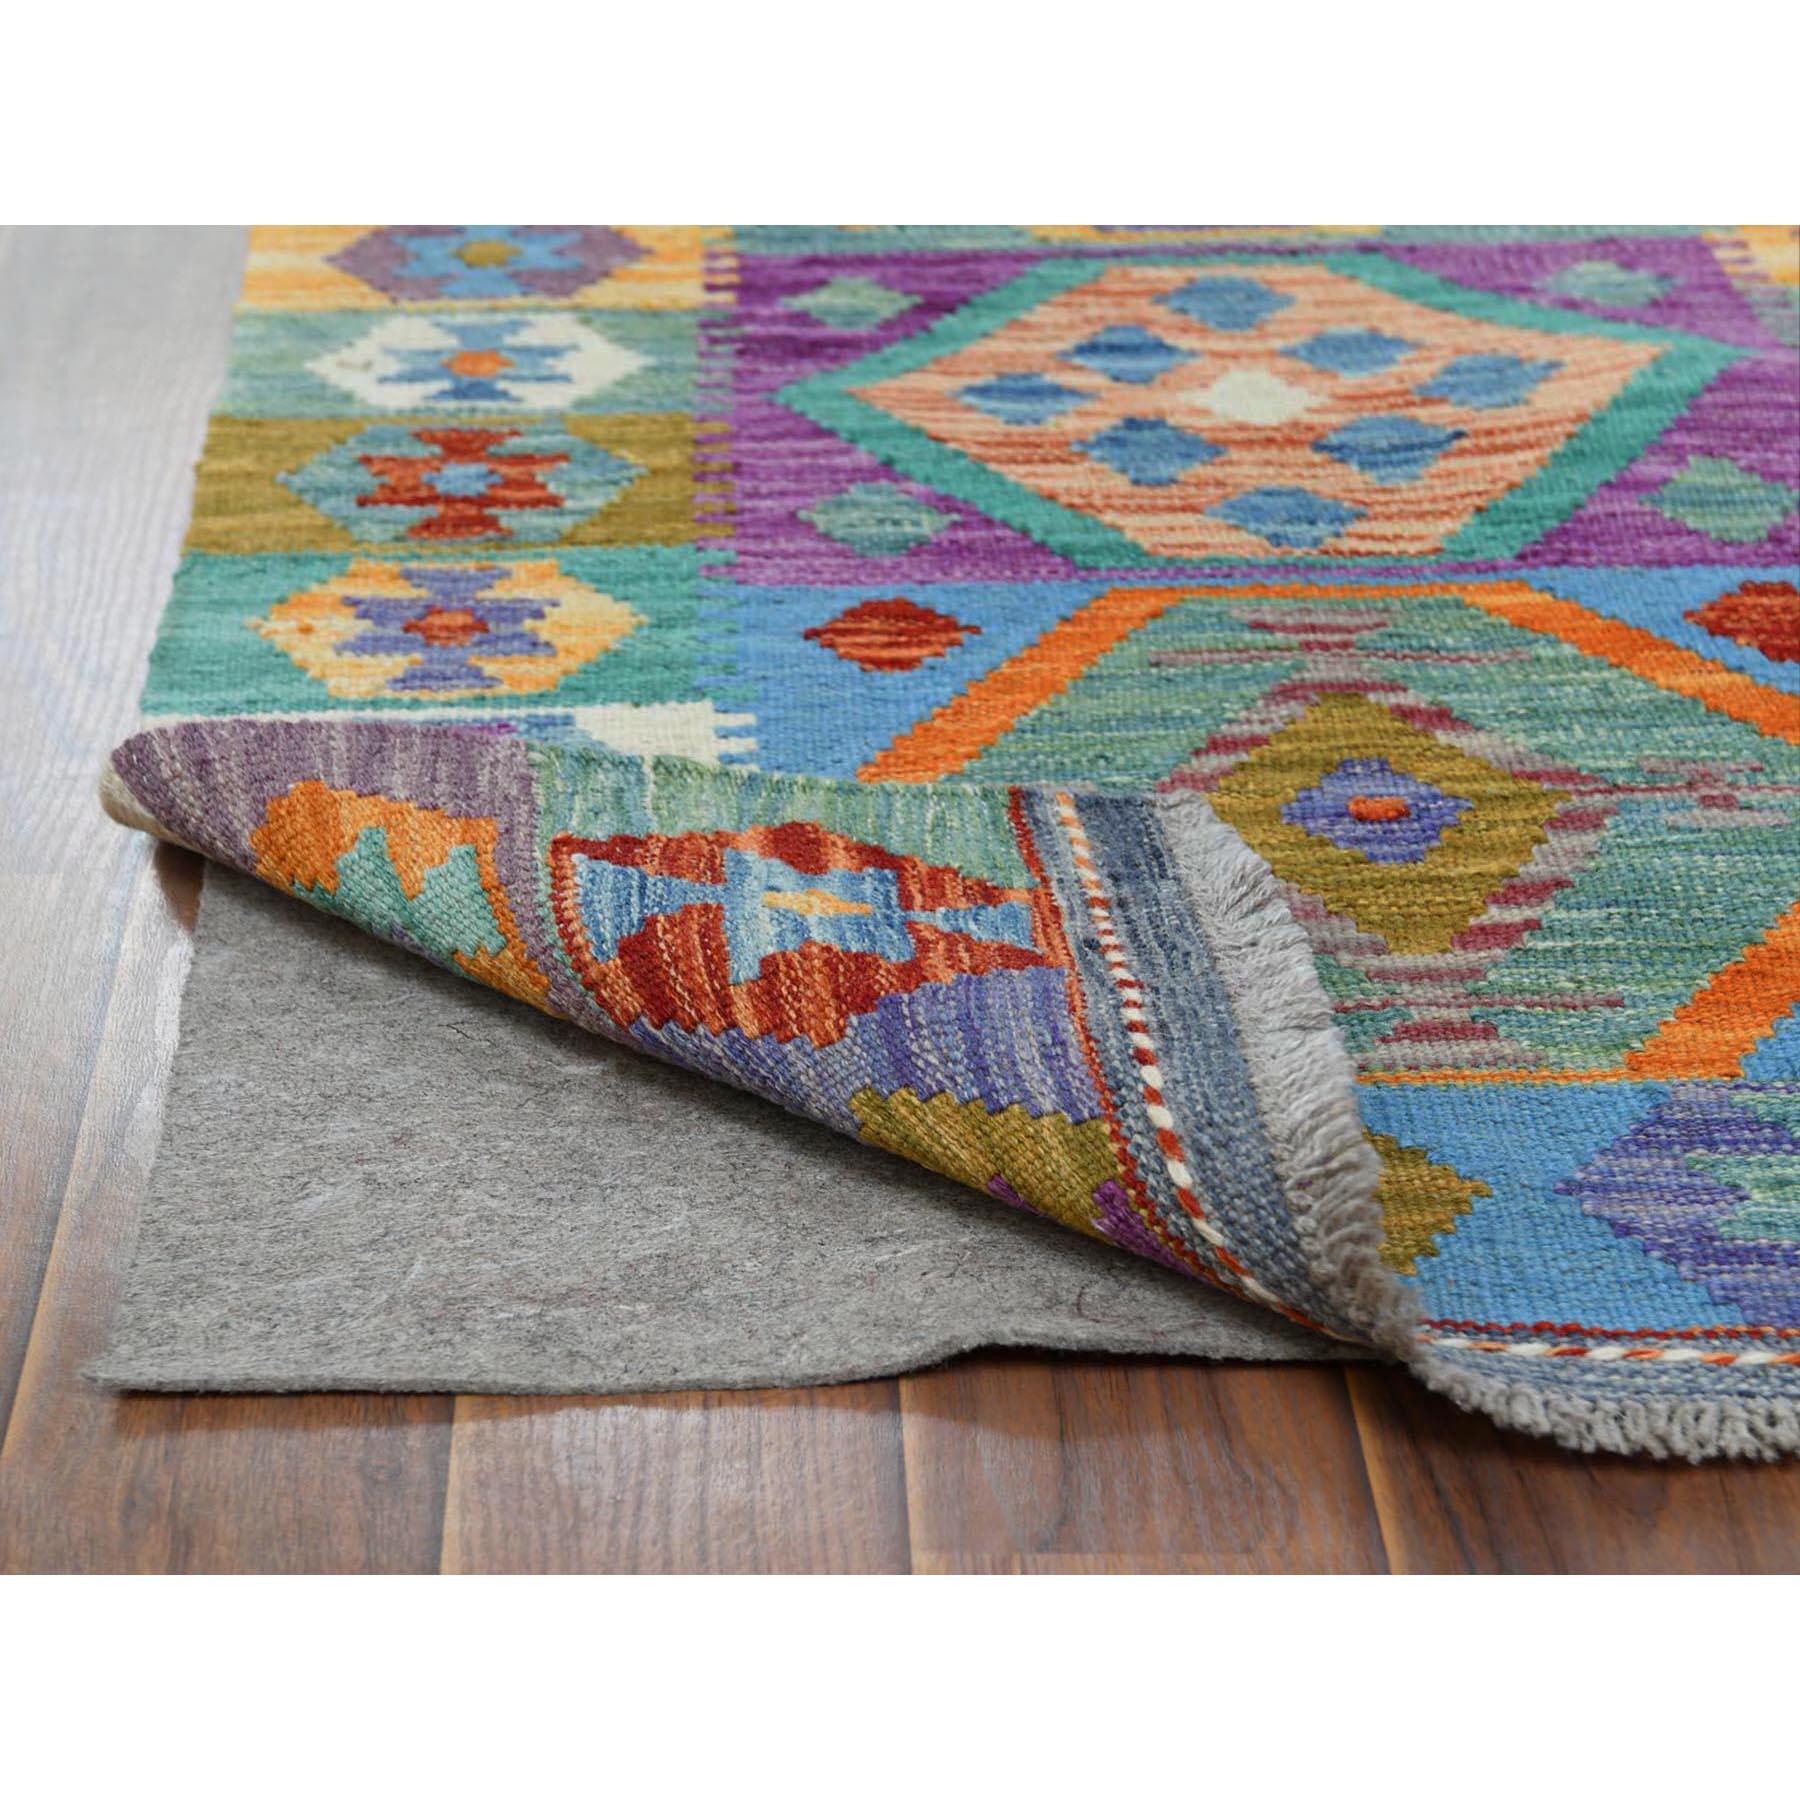 "2'2""x6'1"" Colorful Geometric Design Afghan Kilim Reversible Organic Wool Hand Woven Oriental Runner Rug"